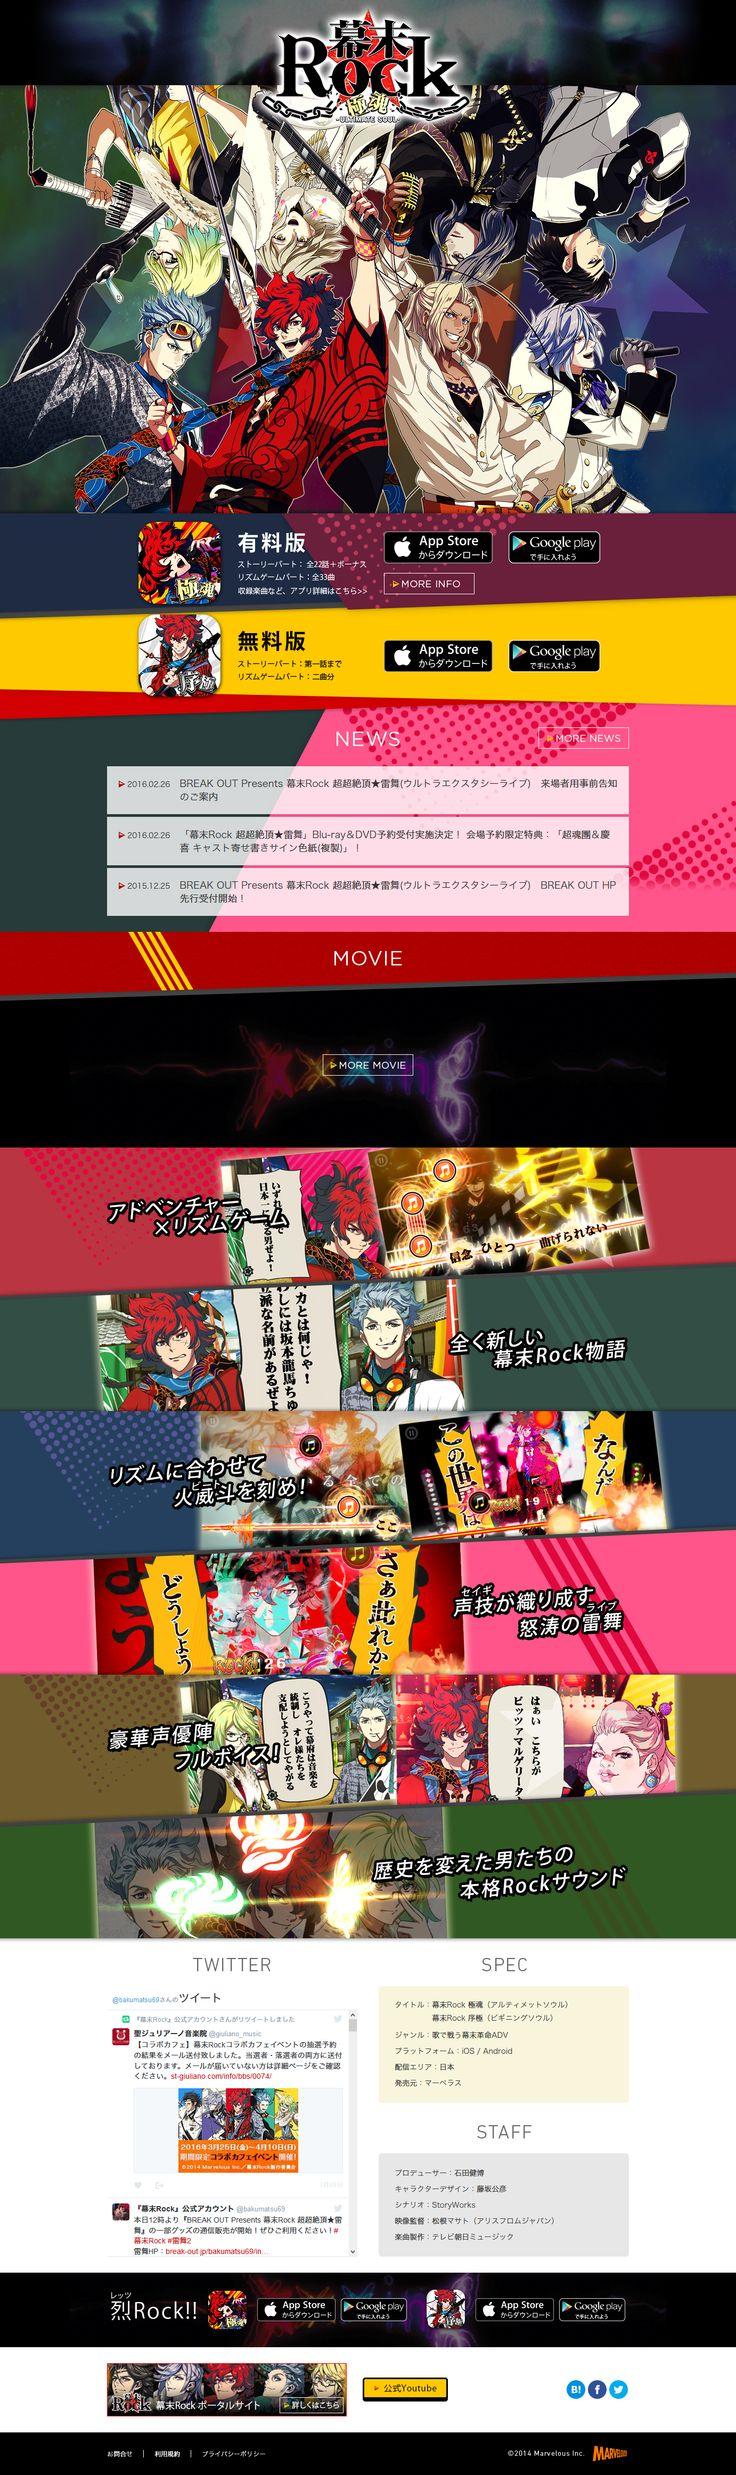 BAKUMATSU Rock ultimate soul(Japanese) #WebDesign